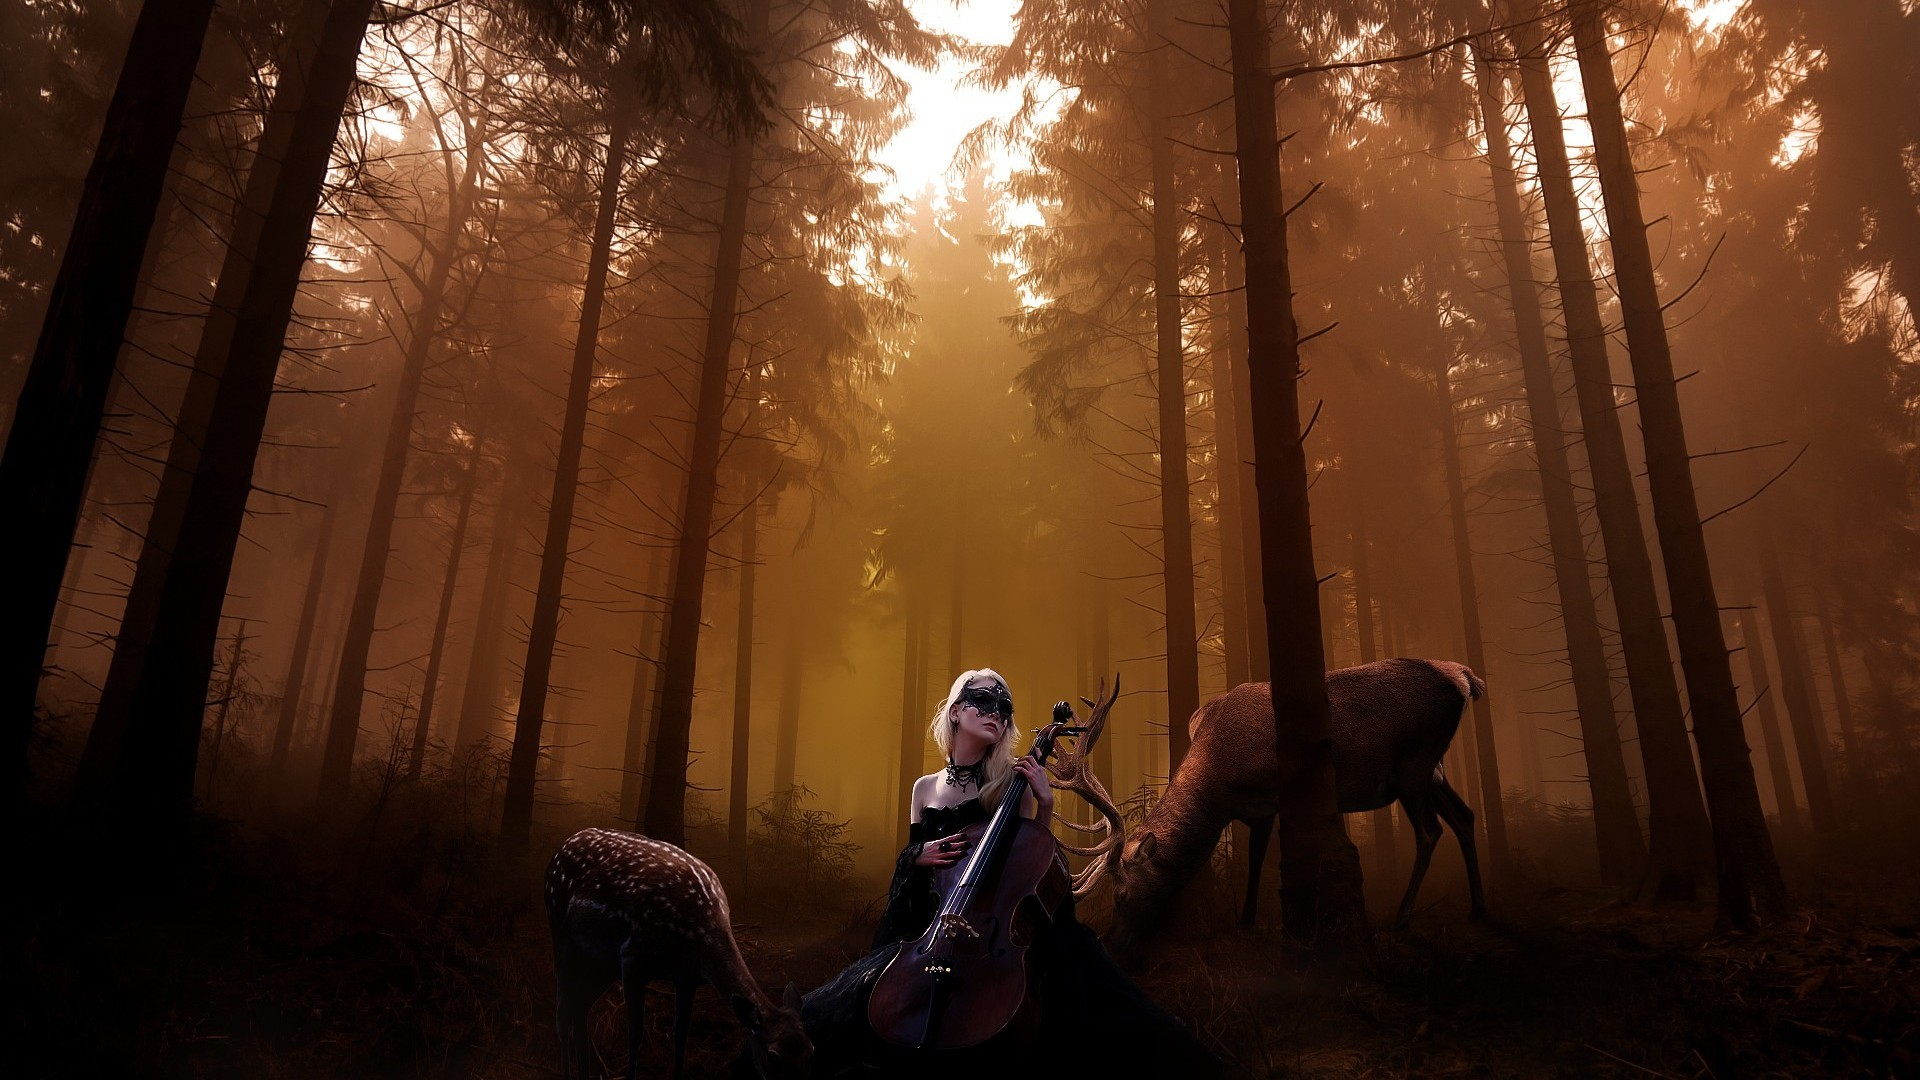 Res: 1920x1080, Cello Backgrounds. Wallpaper: Cello Backgrounds